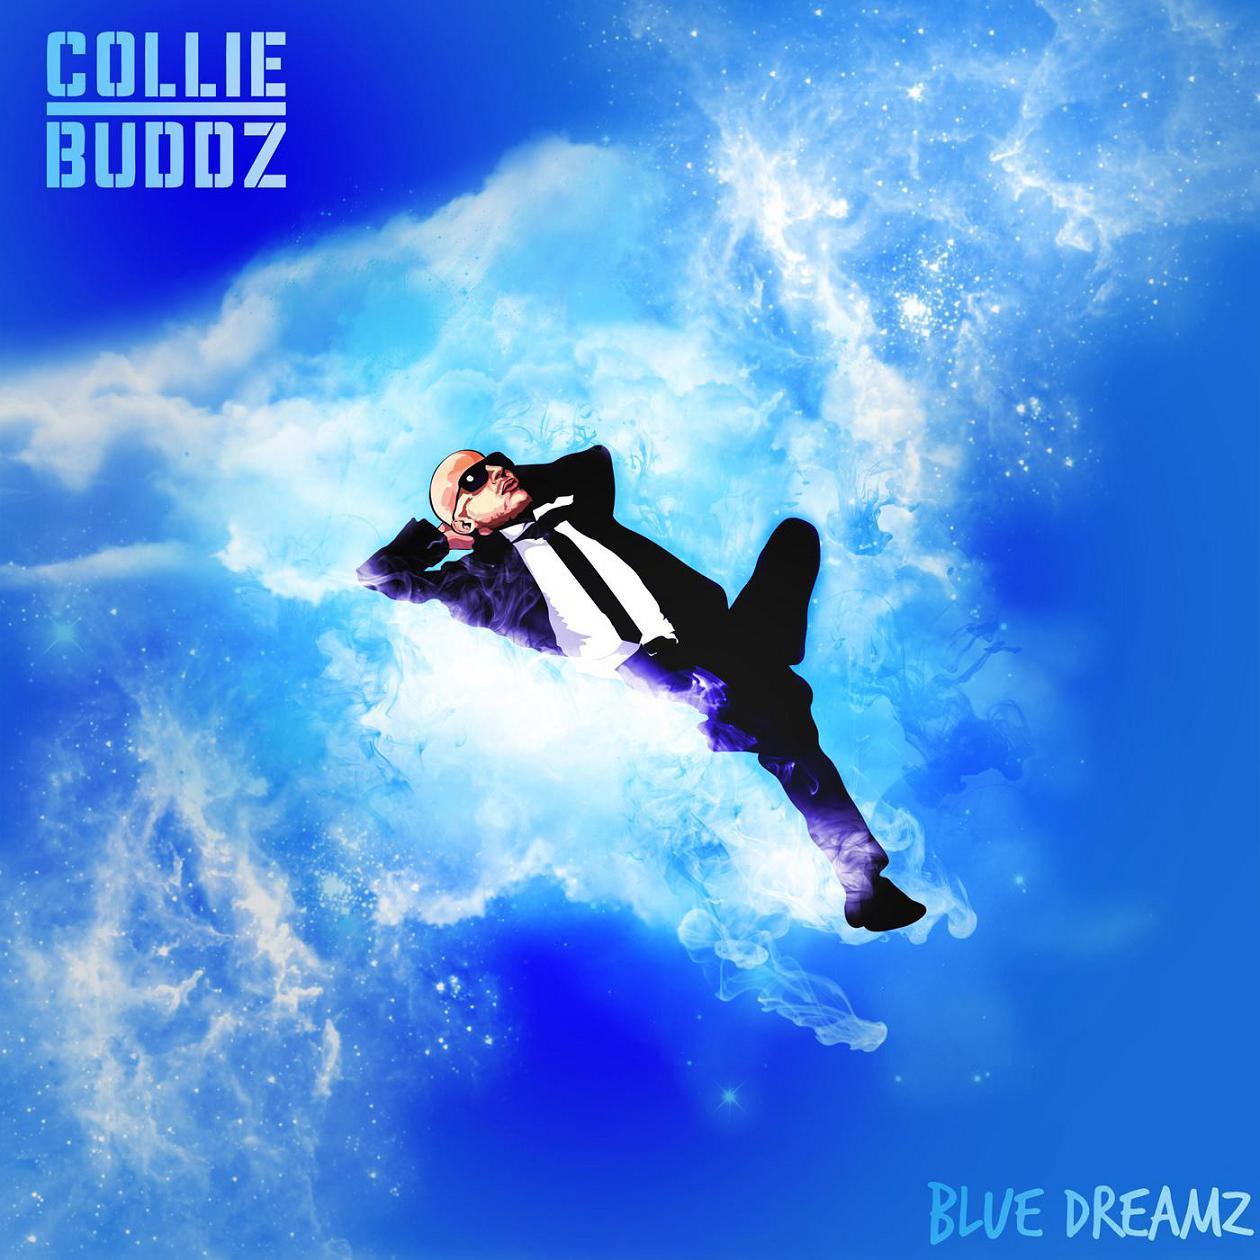 Collie Budz Talks To Stereo Embers